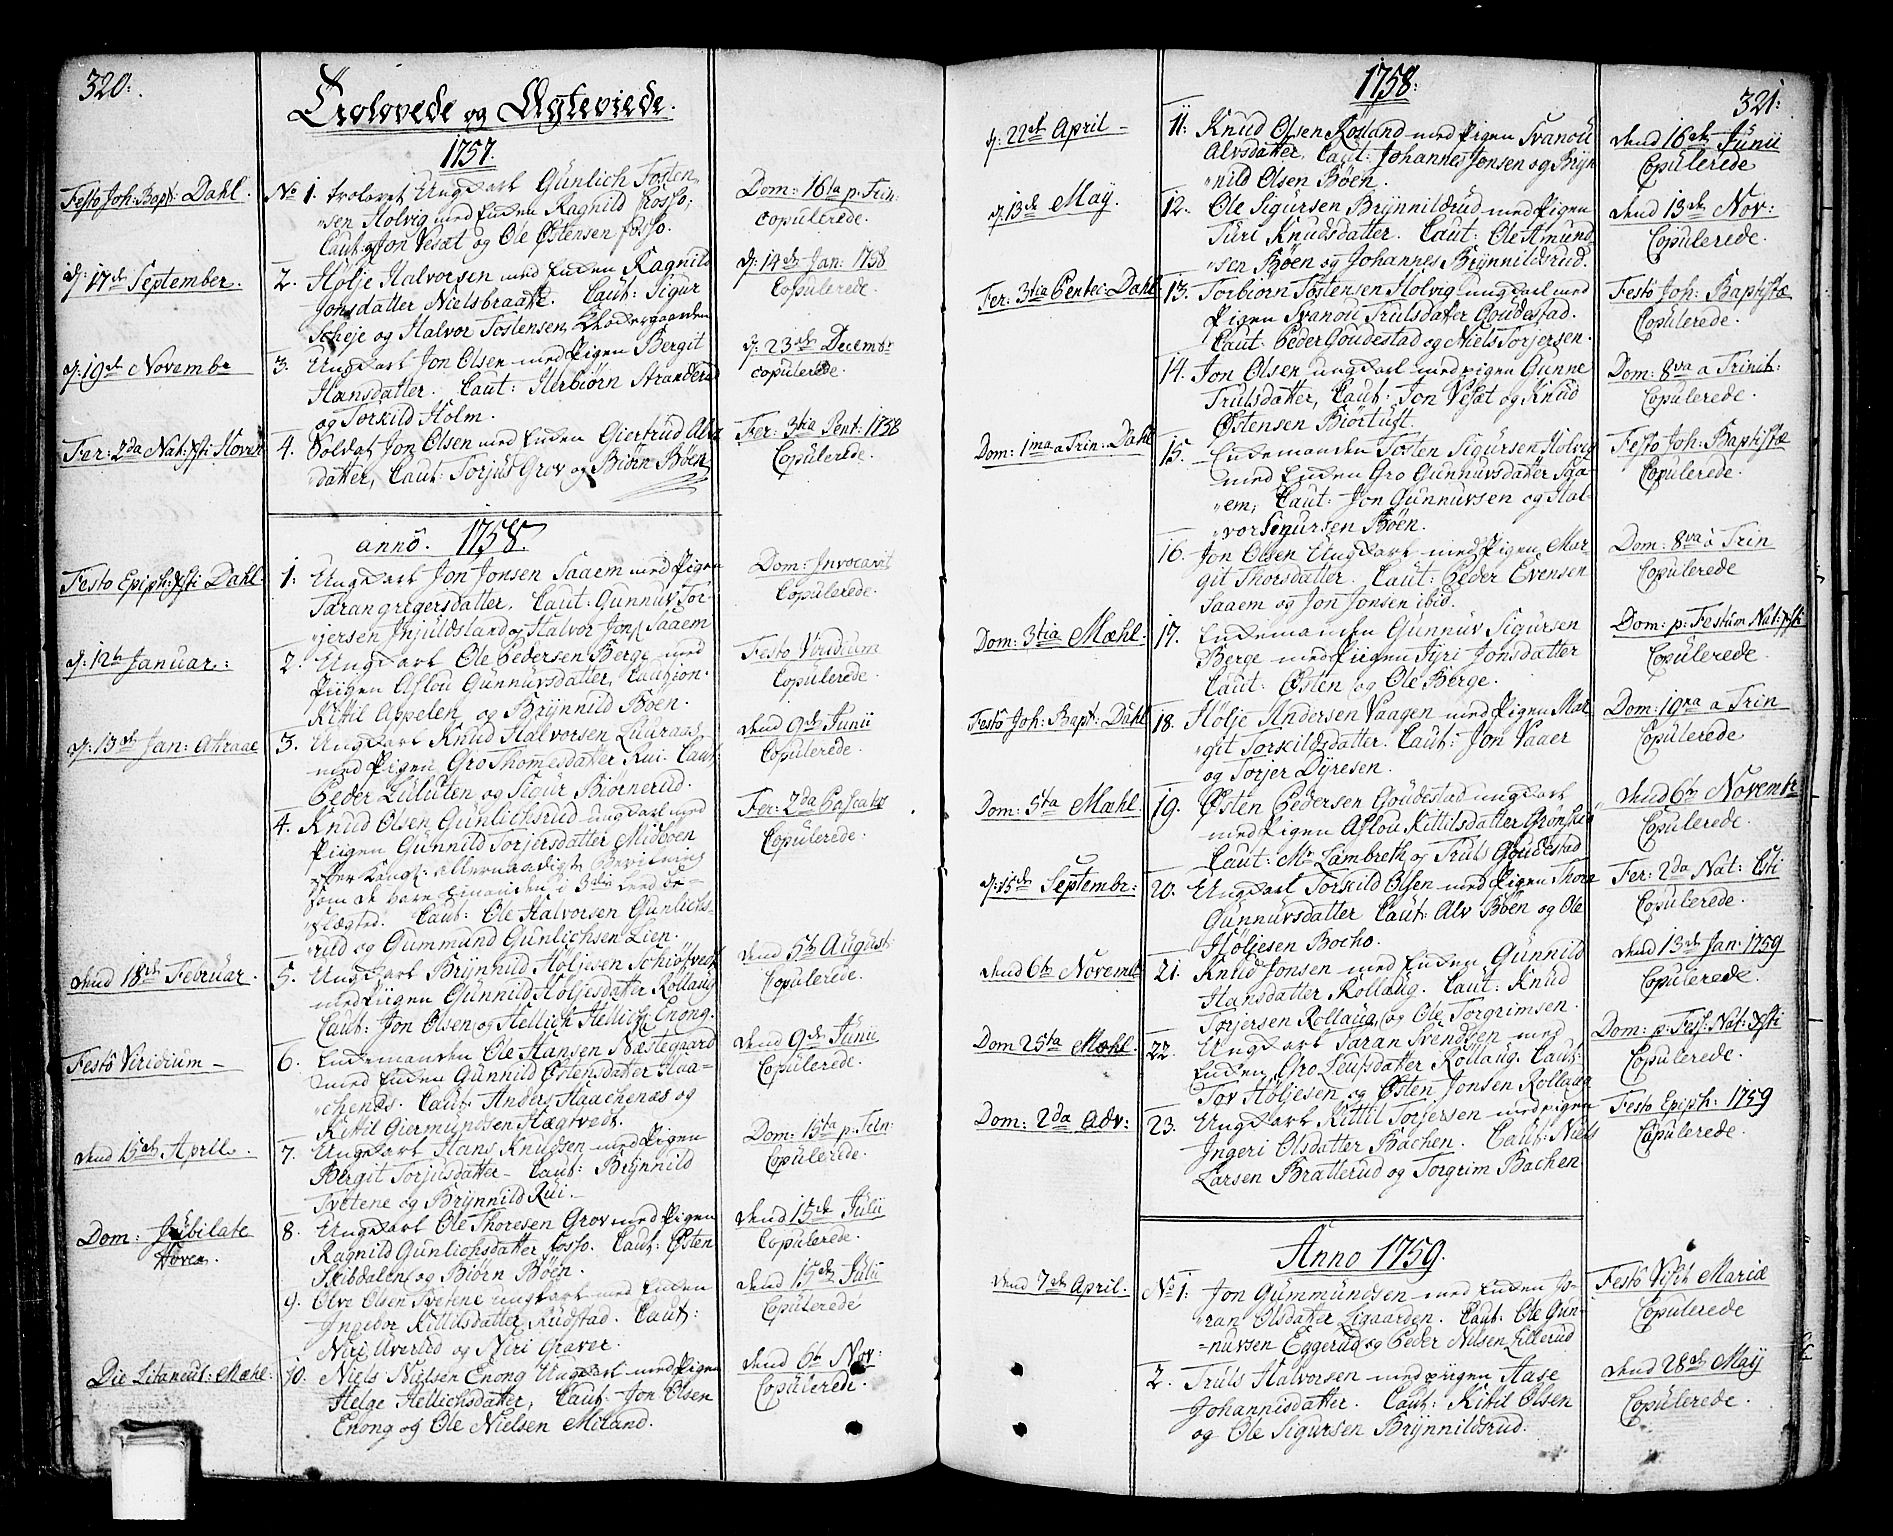 SAKO, Tinn kirkebøker, F/Fa/L0002: Ministerialbok nr. I 2, 1757-1810, s. 320-321